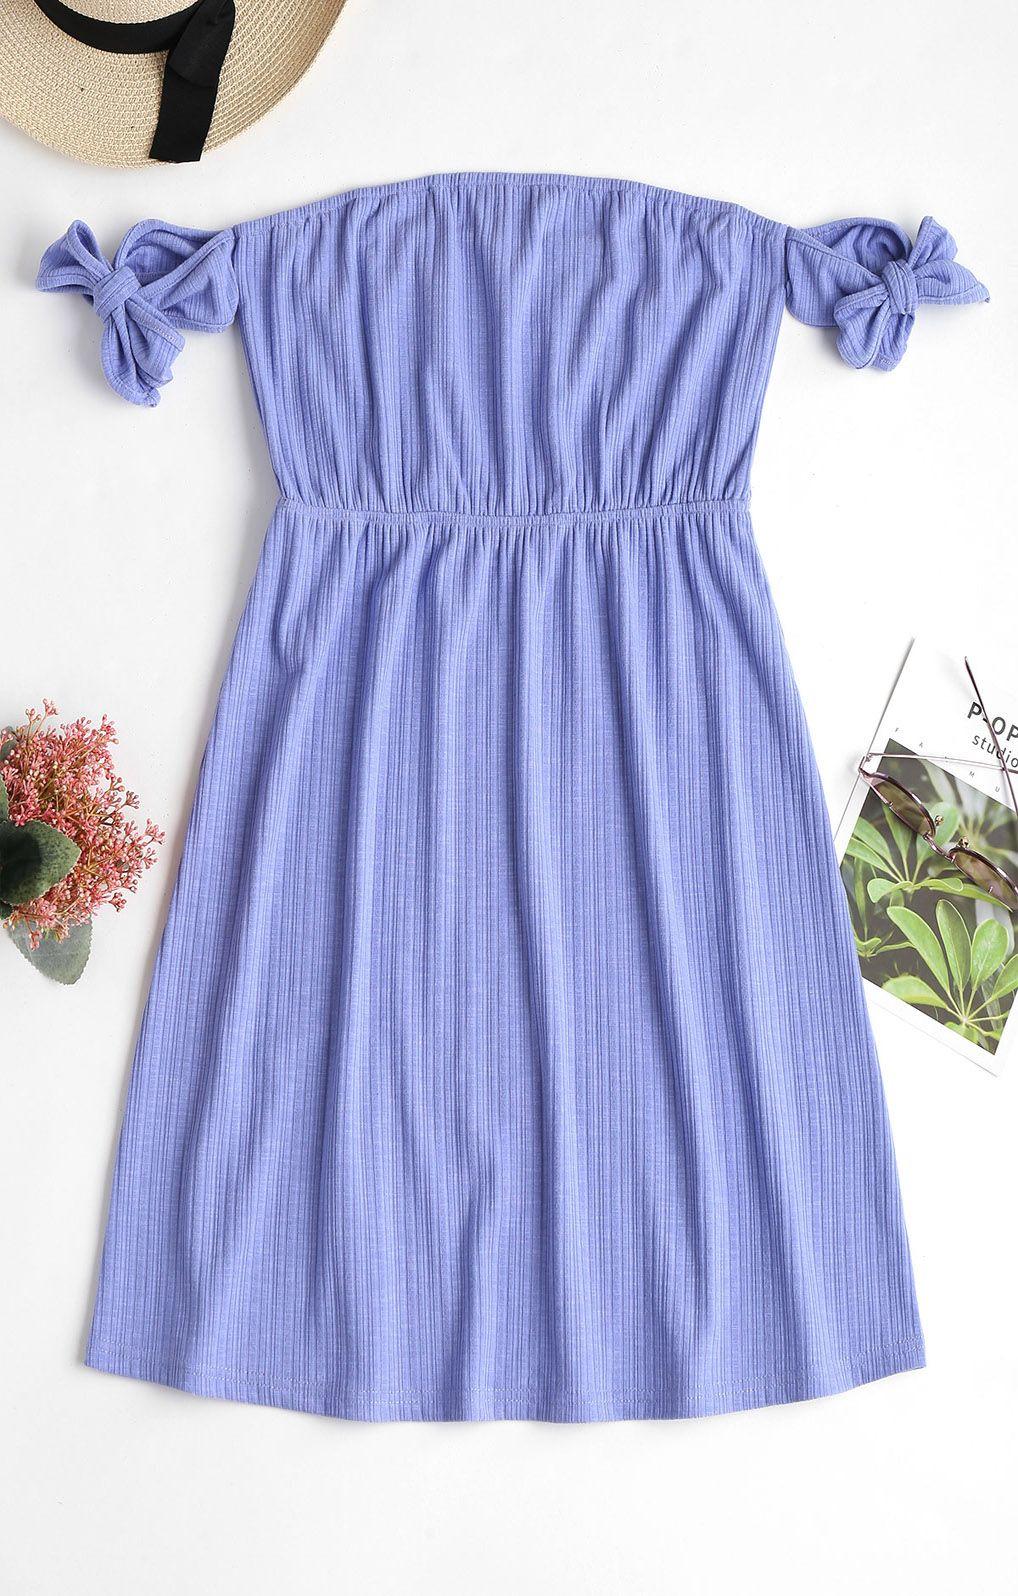 Pin On 2020 Summer Dresses [ 1596 x 1018 Pixel ]